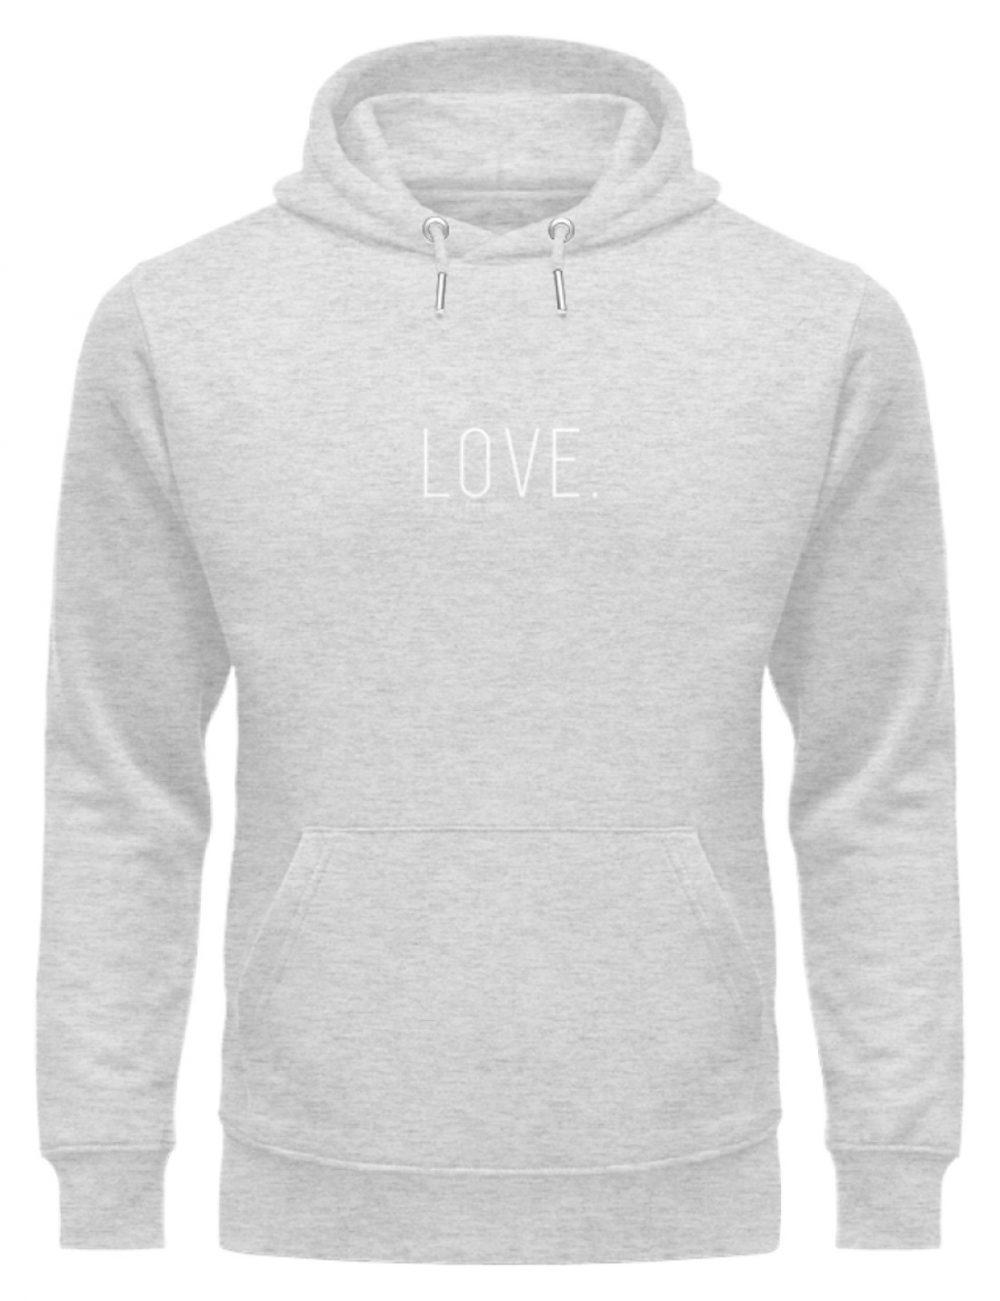 LOVE. - Unisex Organic Hoodie-6892